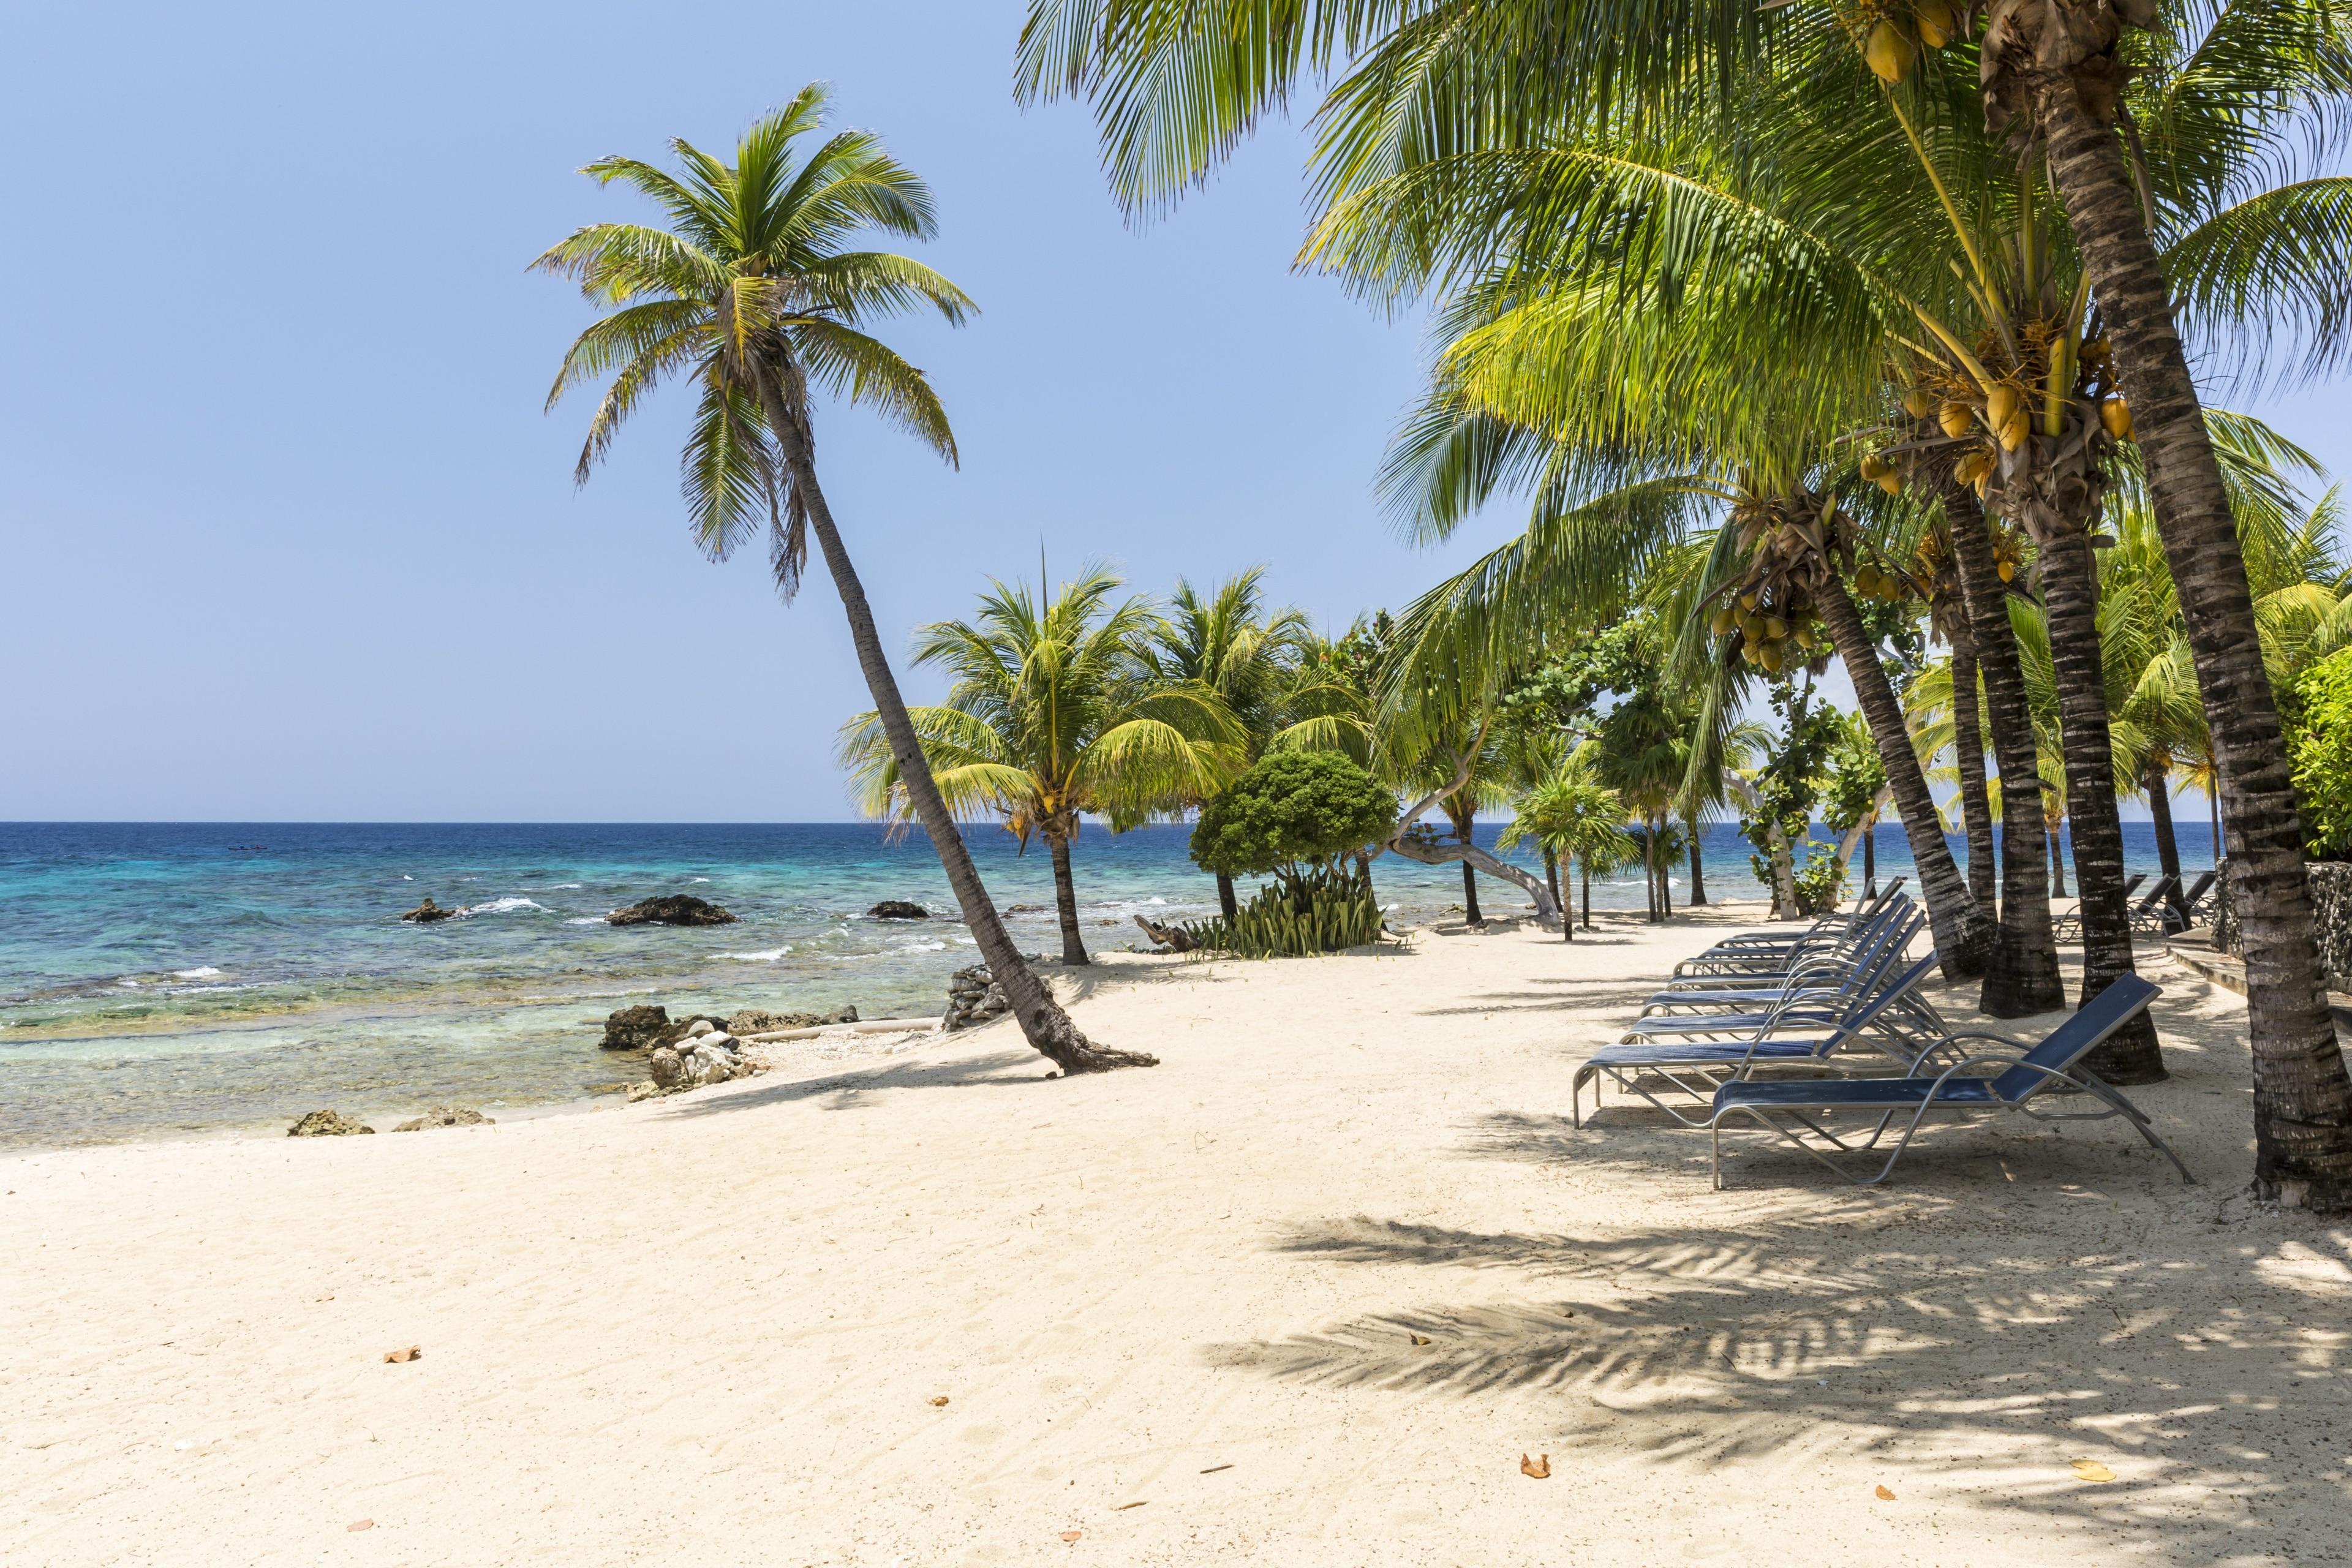 Bay Islands, Honduras